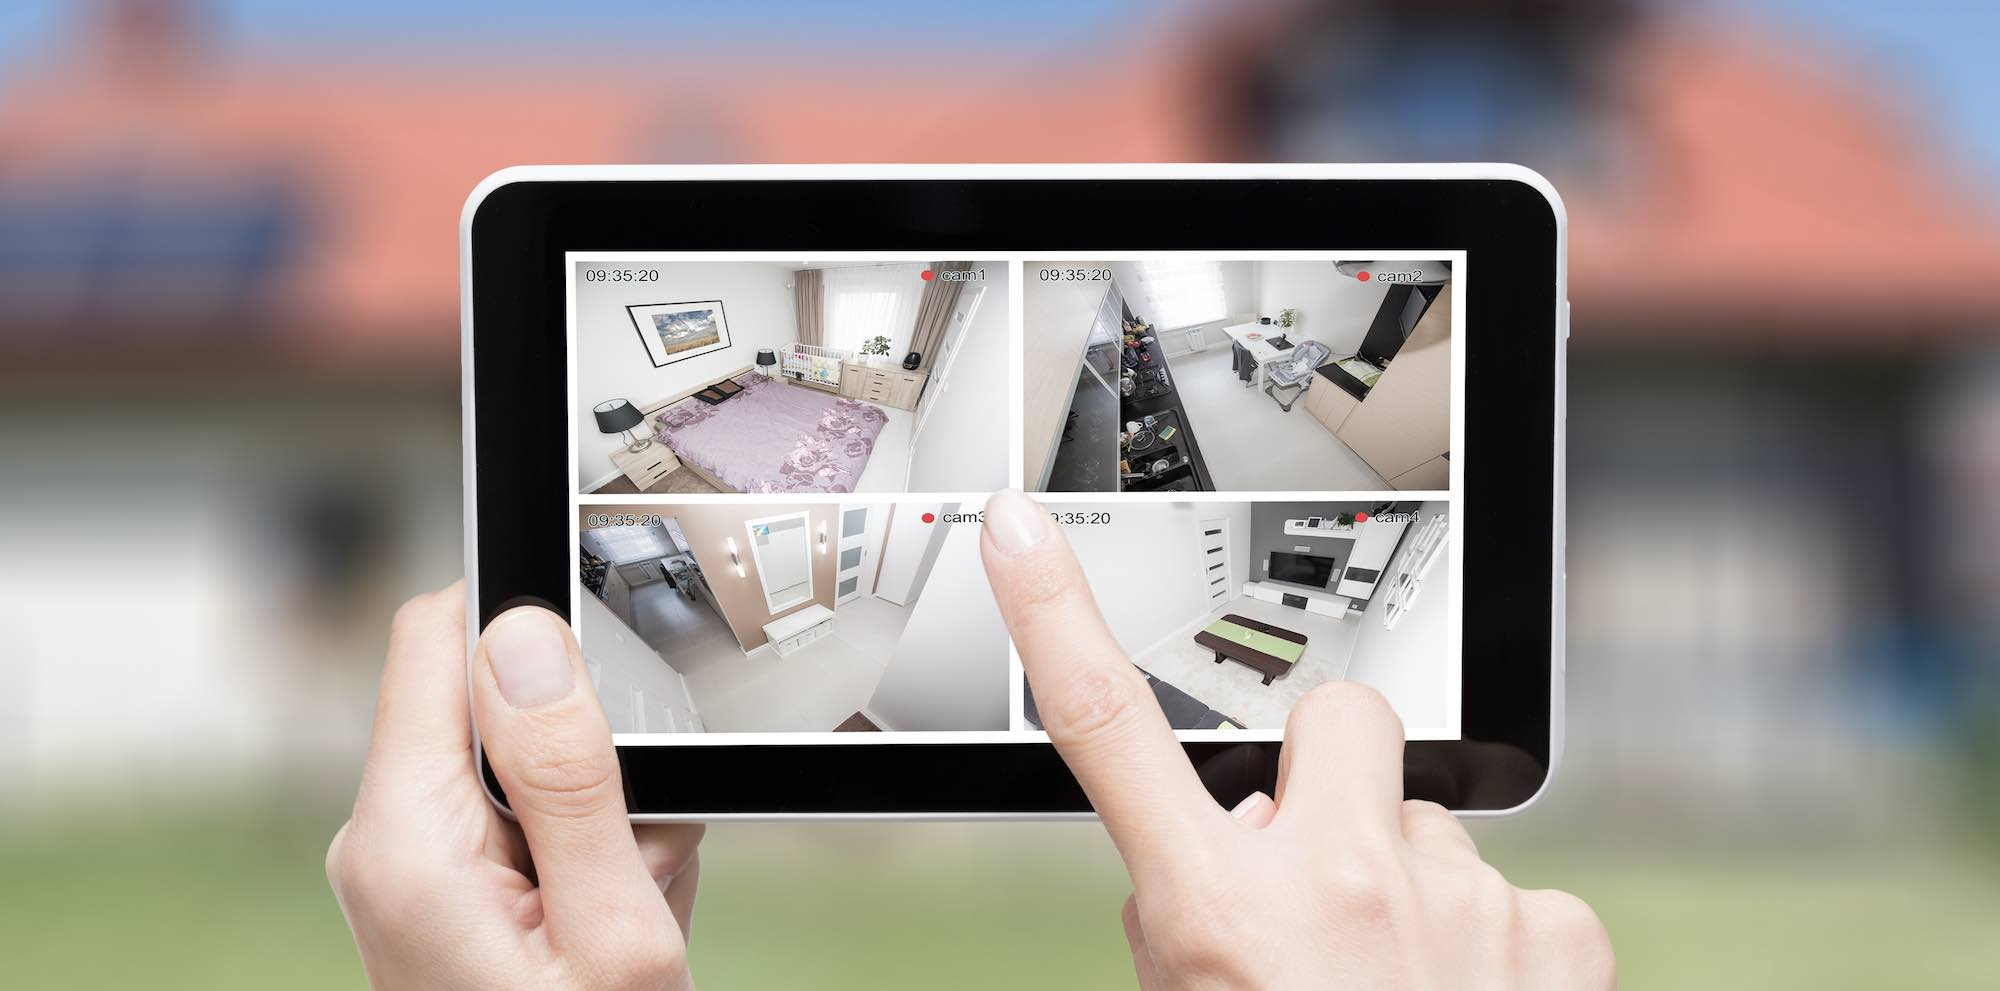 Videoüberwachung via Tablet im Innenraum